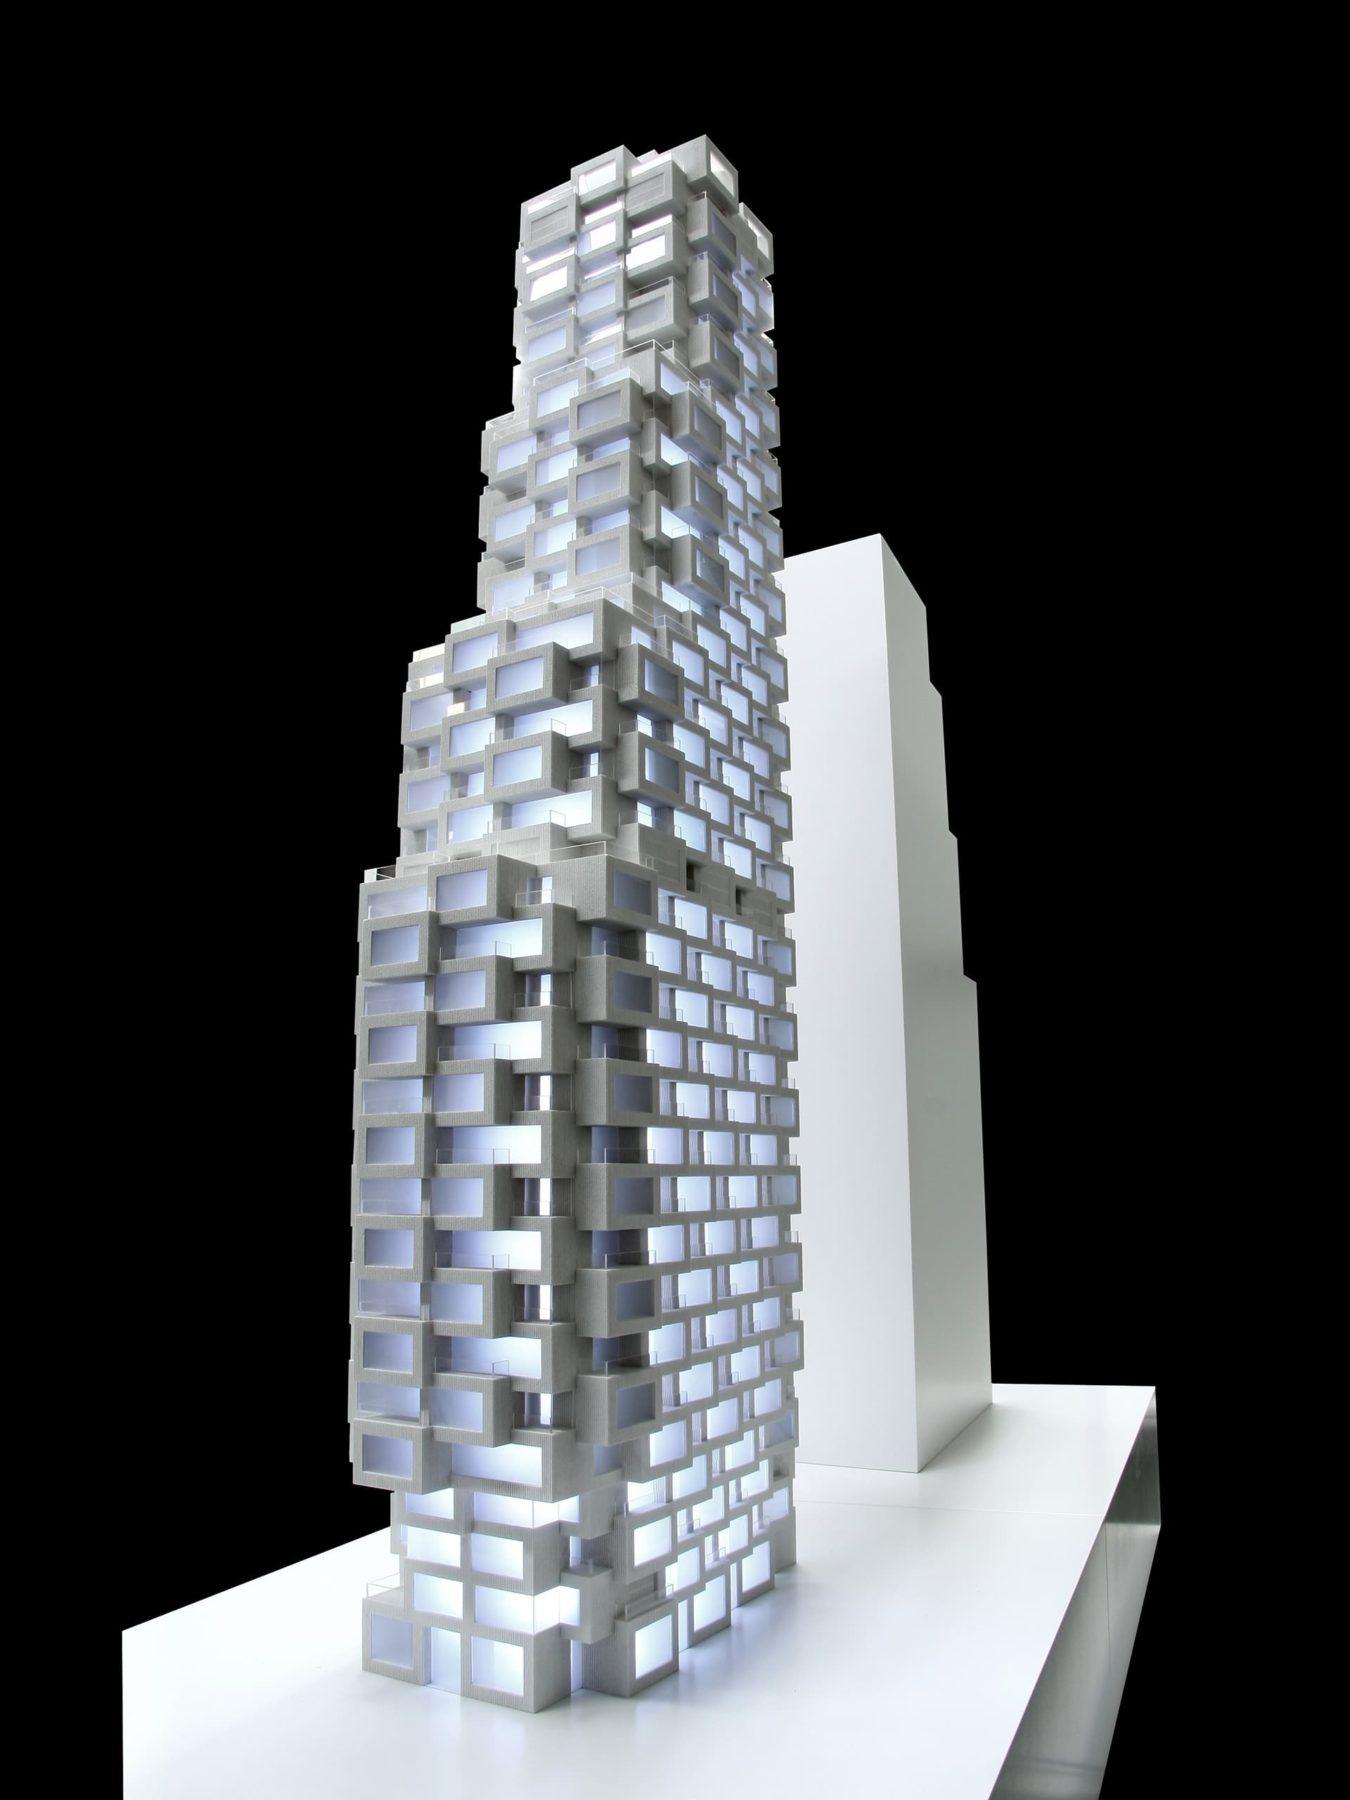 Architekturmodell Helix Innovation der Norra Tornen in Stockholm